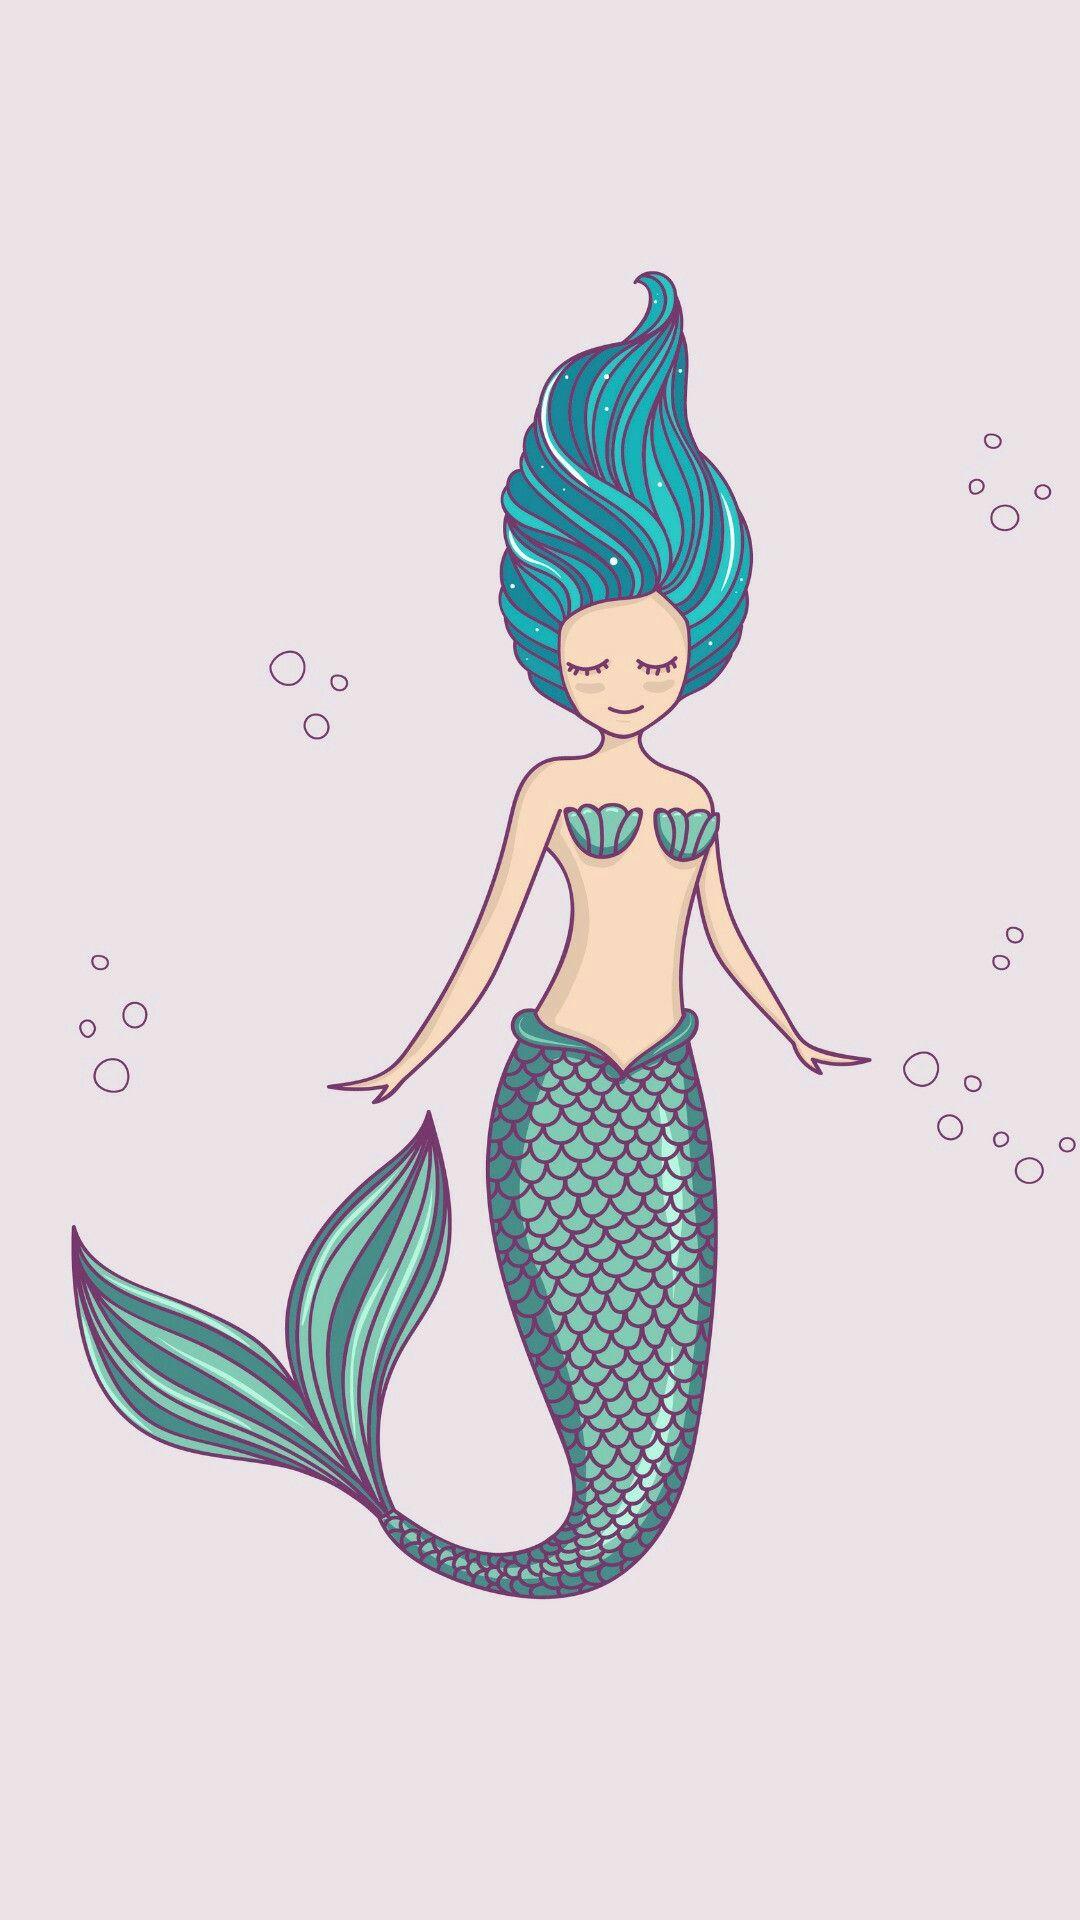 Mermaid Wallpaper Wallpapers V Roce 2019 Pinterest Mermaid